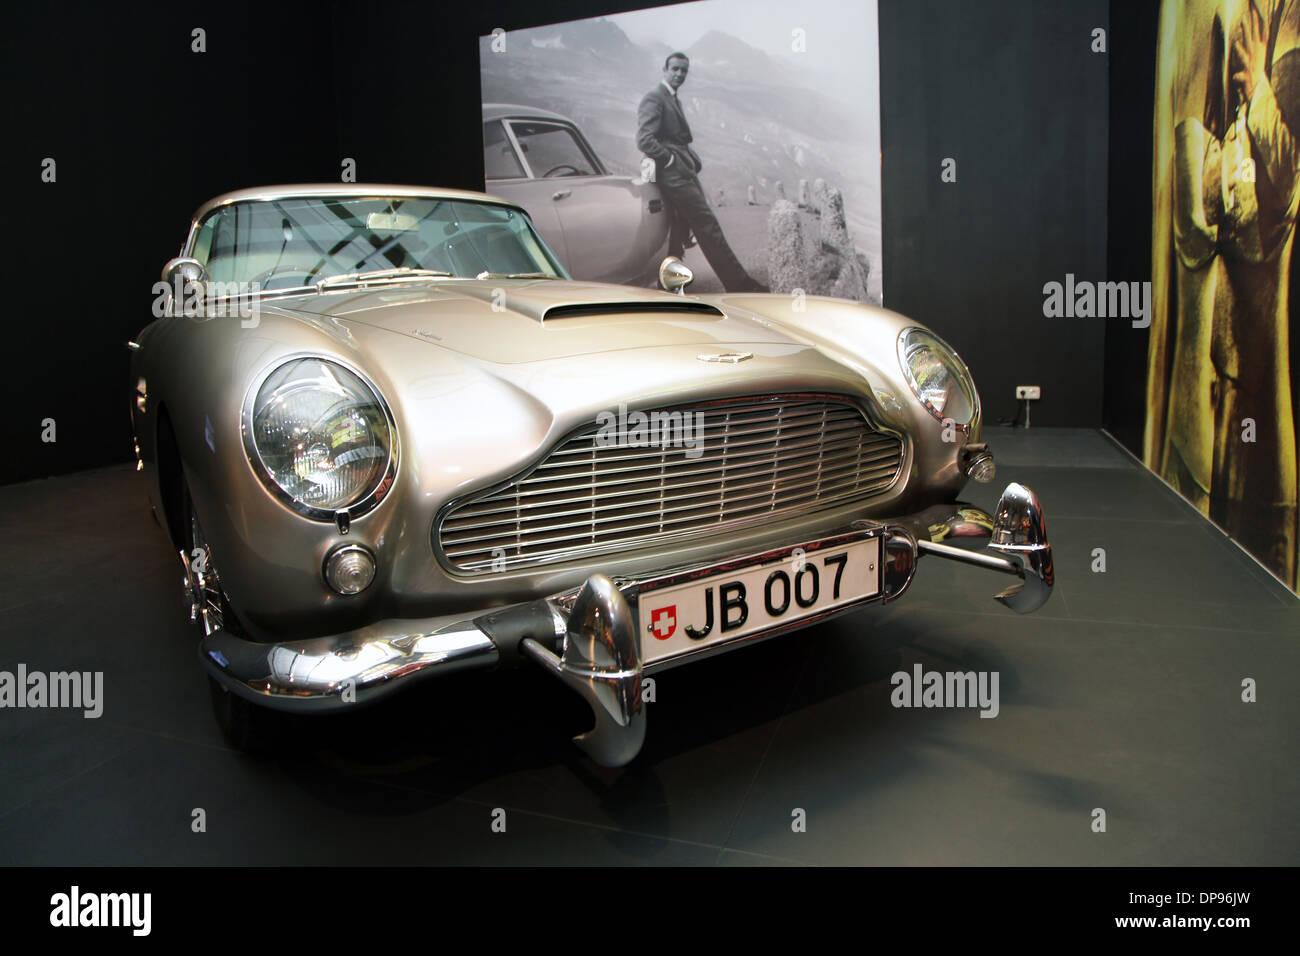 Aston Martin DB5 James Bond.The Original from Goldfinger.1964. 4 litre six cylinder.Power 282 HP - Stock Image